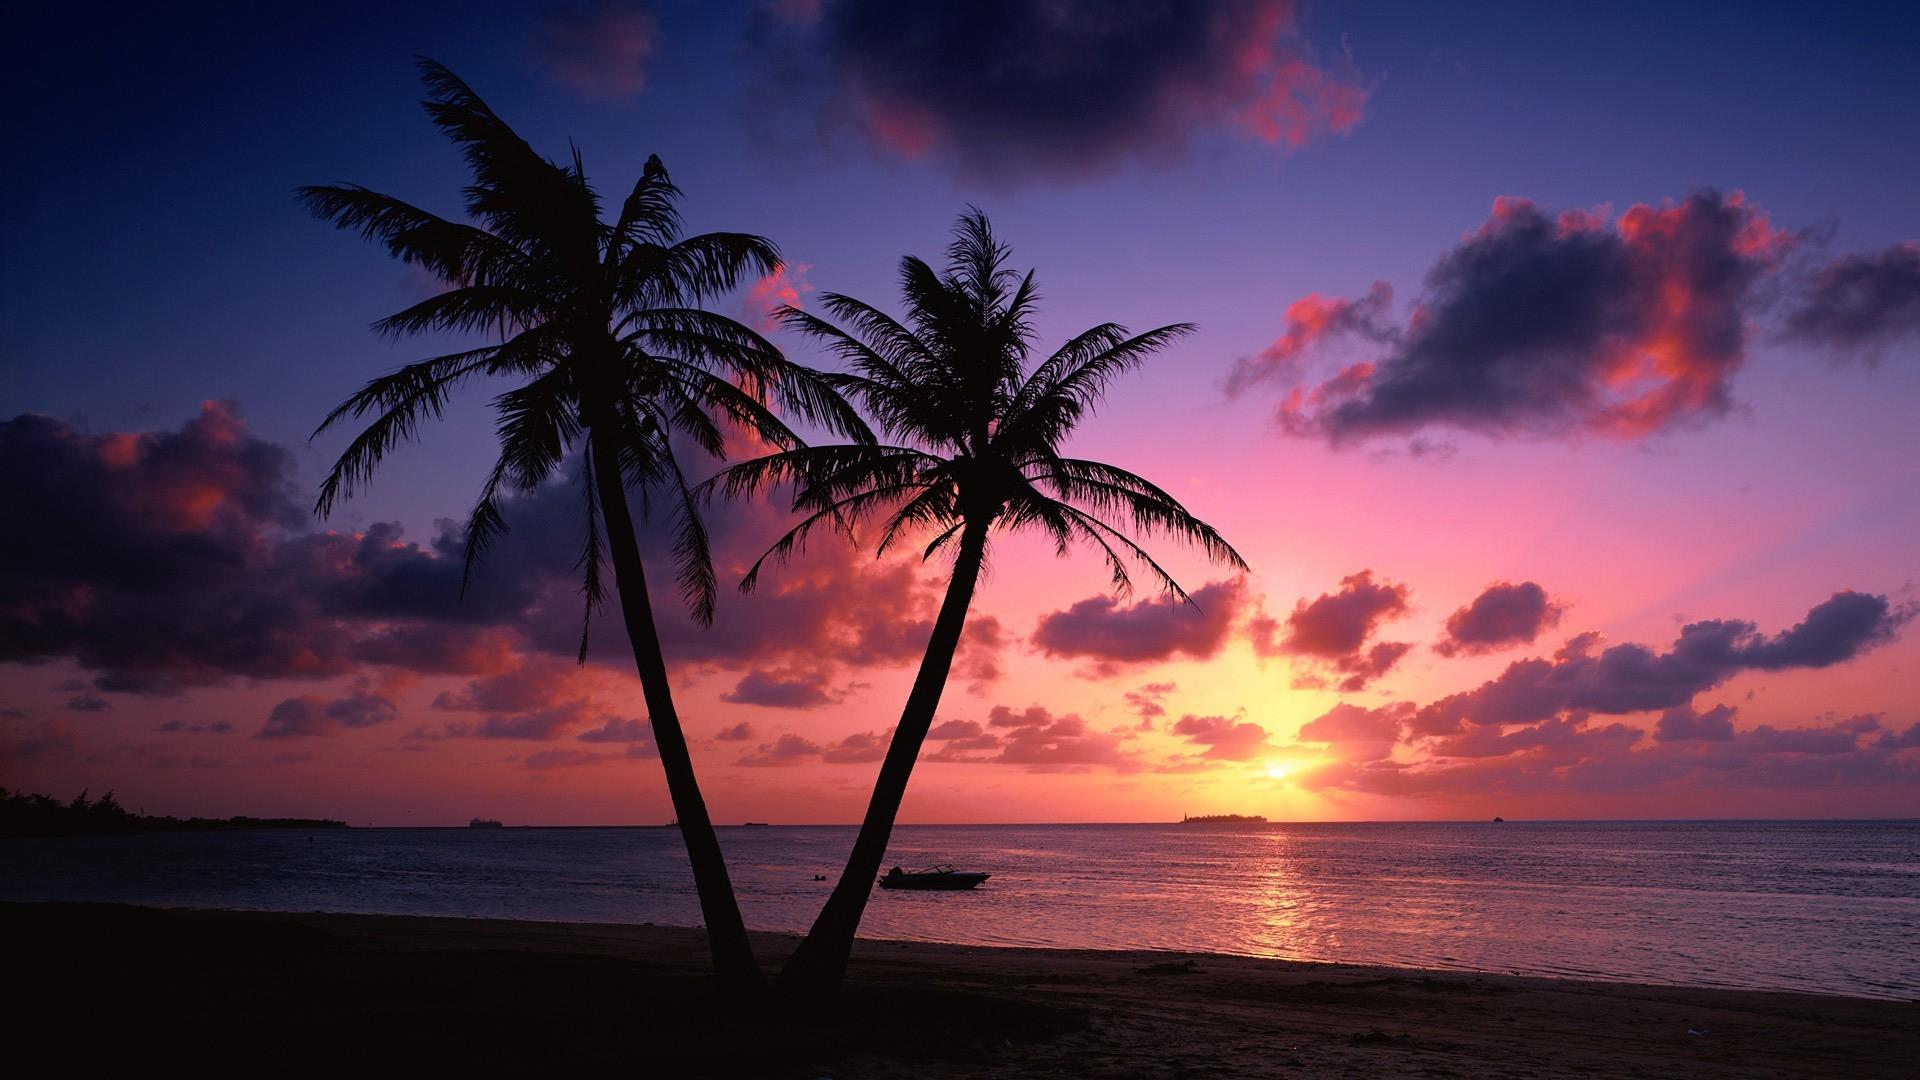 Palm tree beach wallpaper wallpapertag - Free palm tree screensavers ...